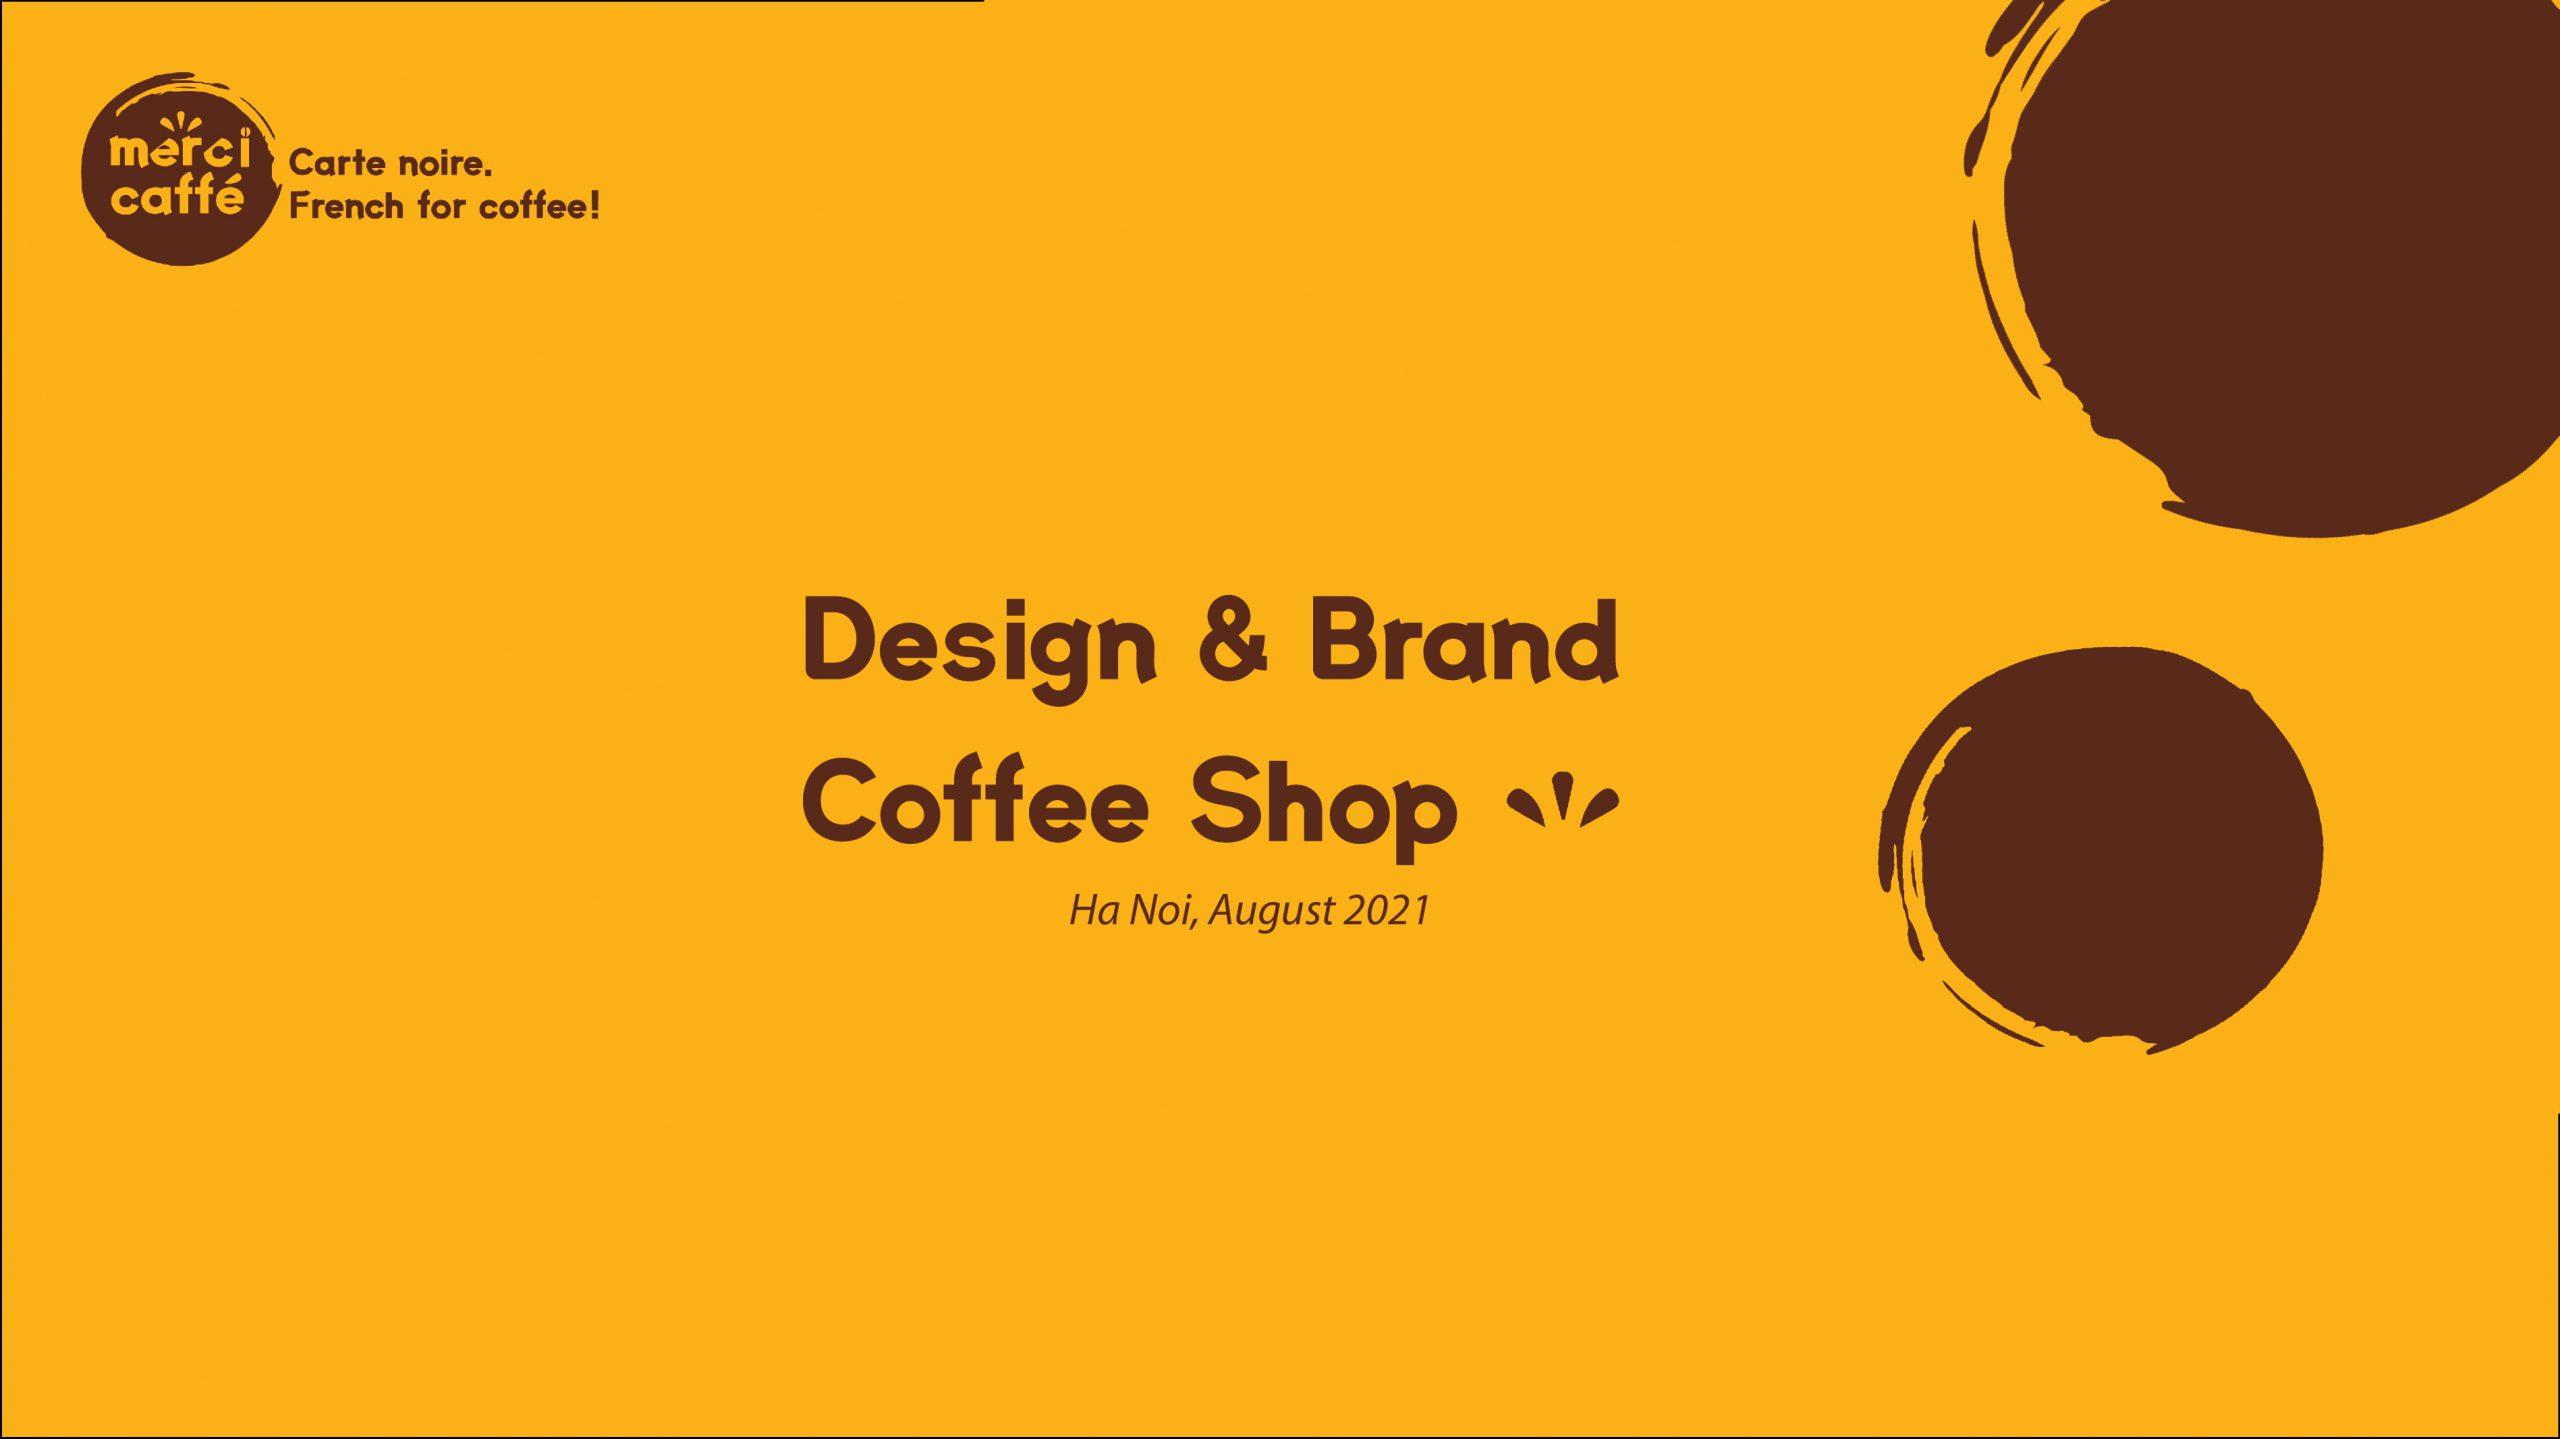 Project sem 1 | Merci Caffé | Lớp A1.2103.E